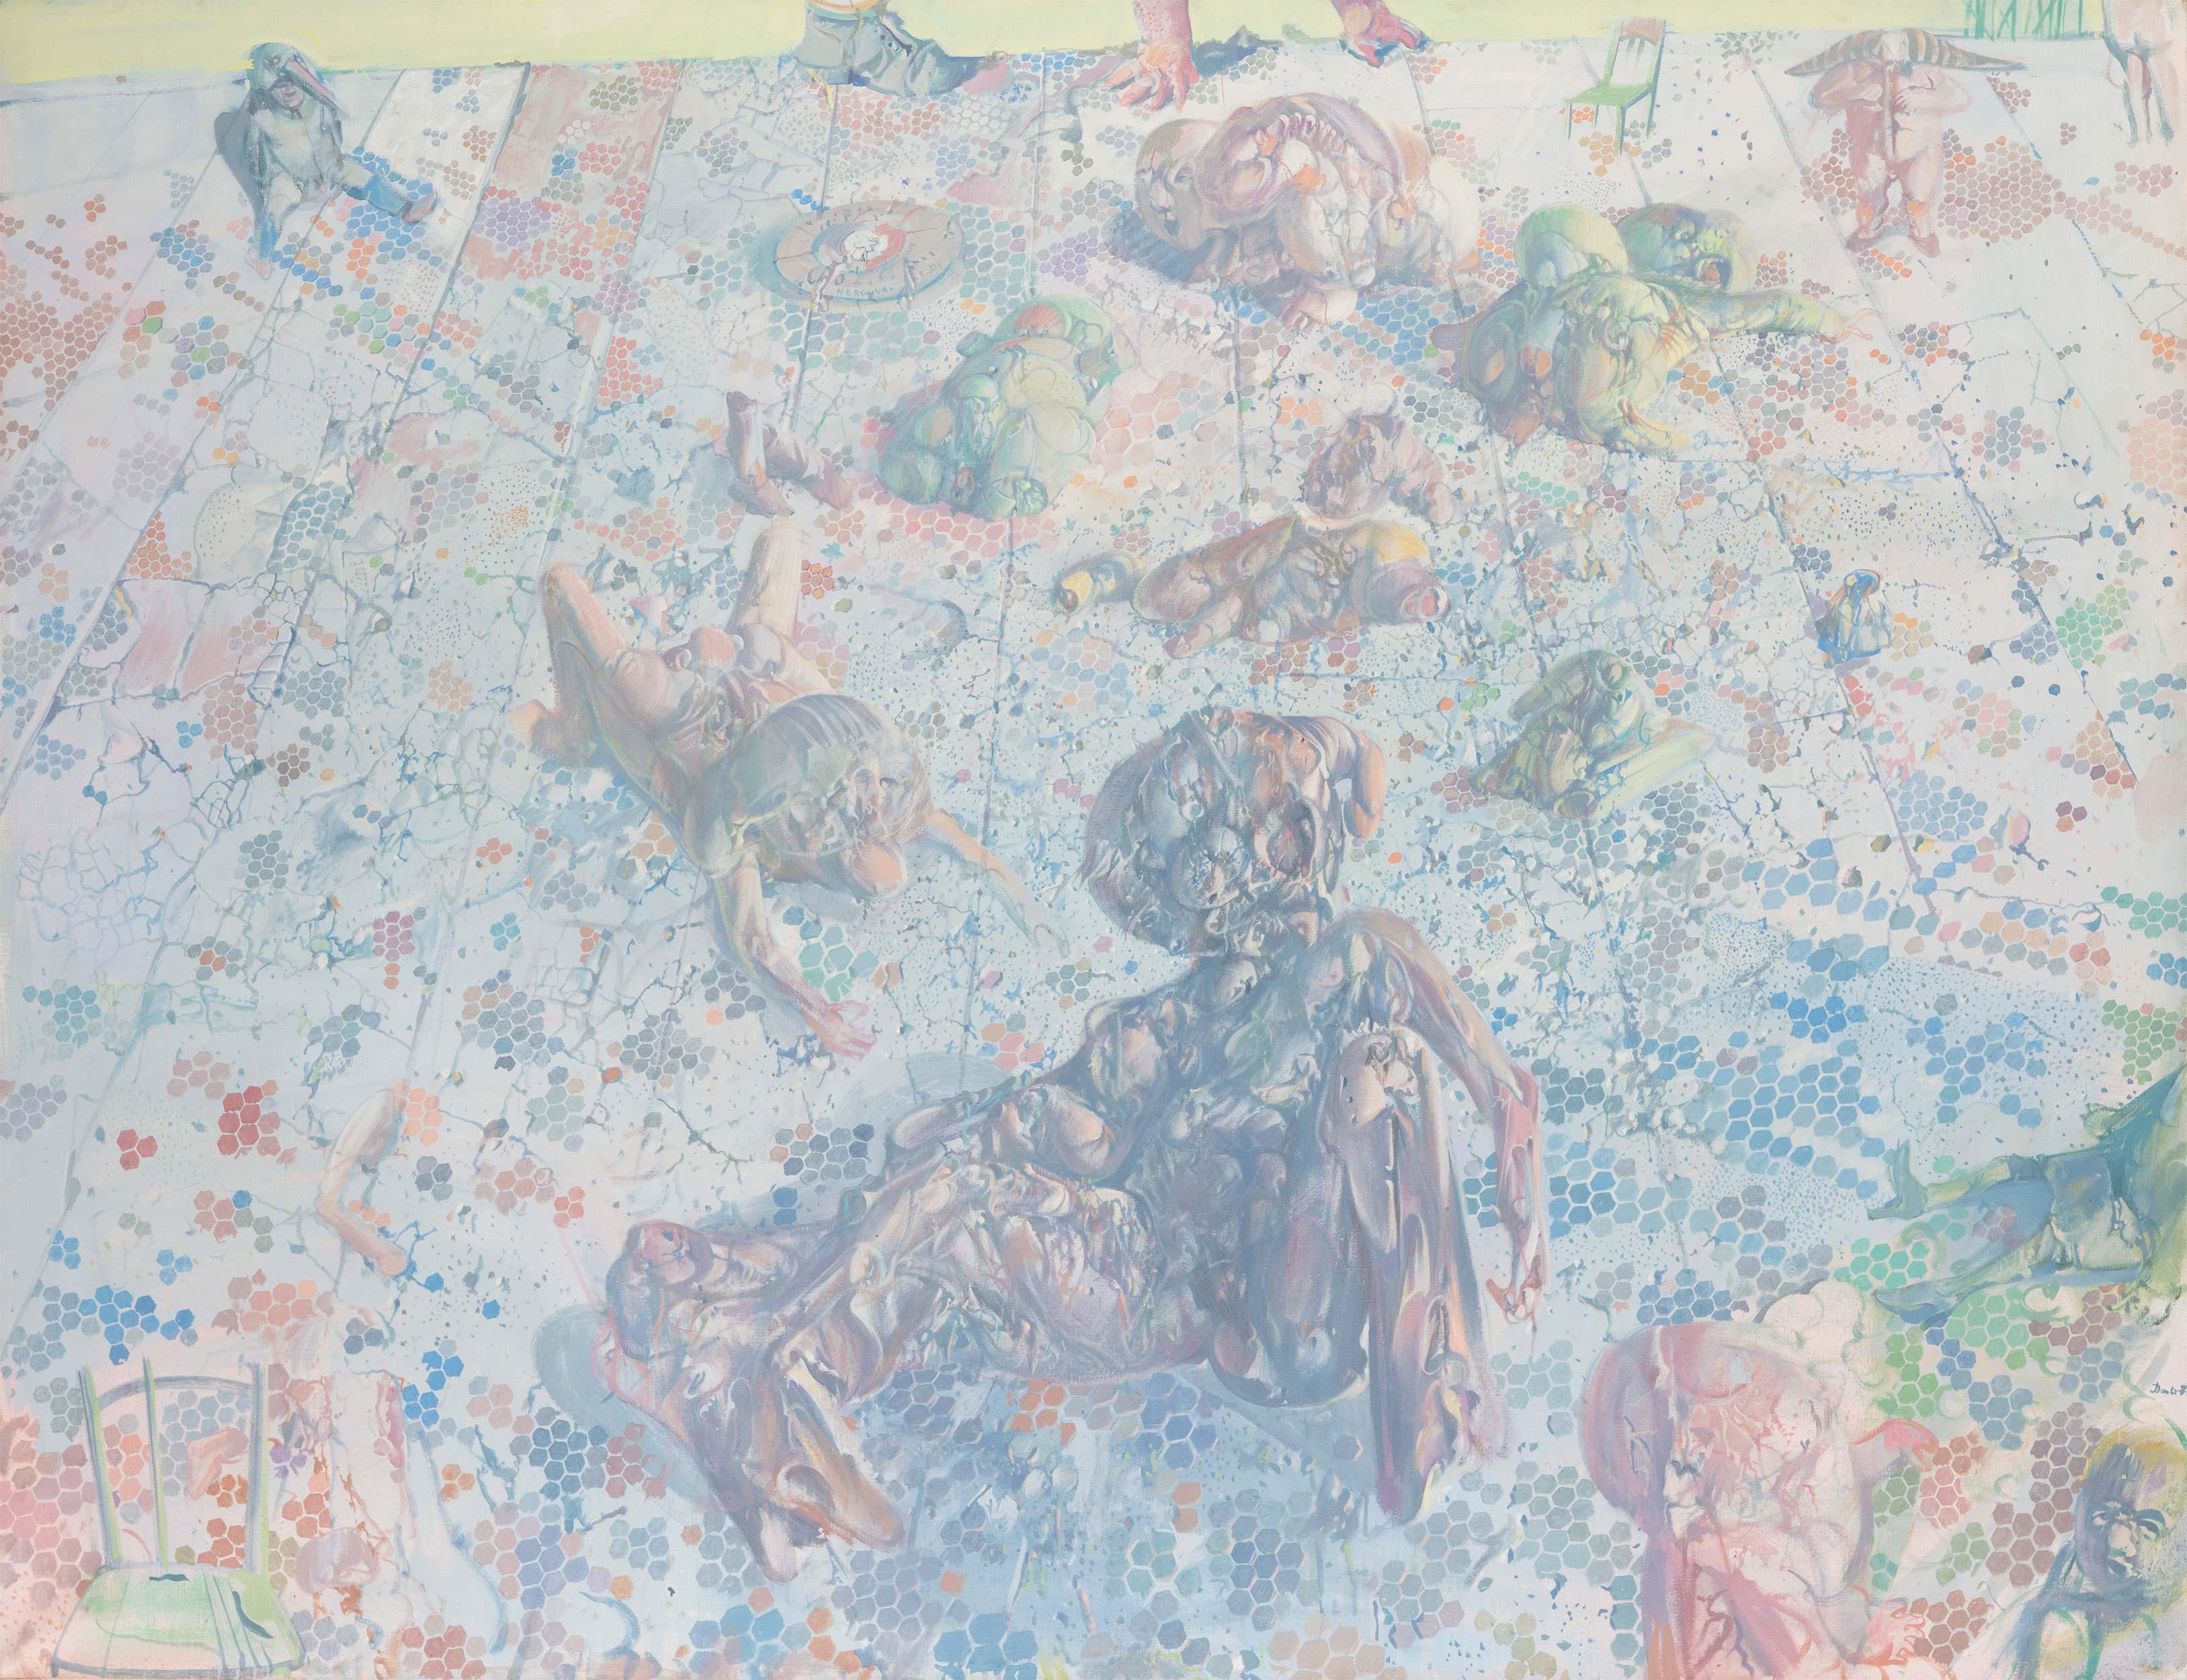 Dječja soba, 1971